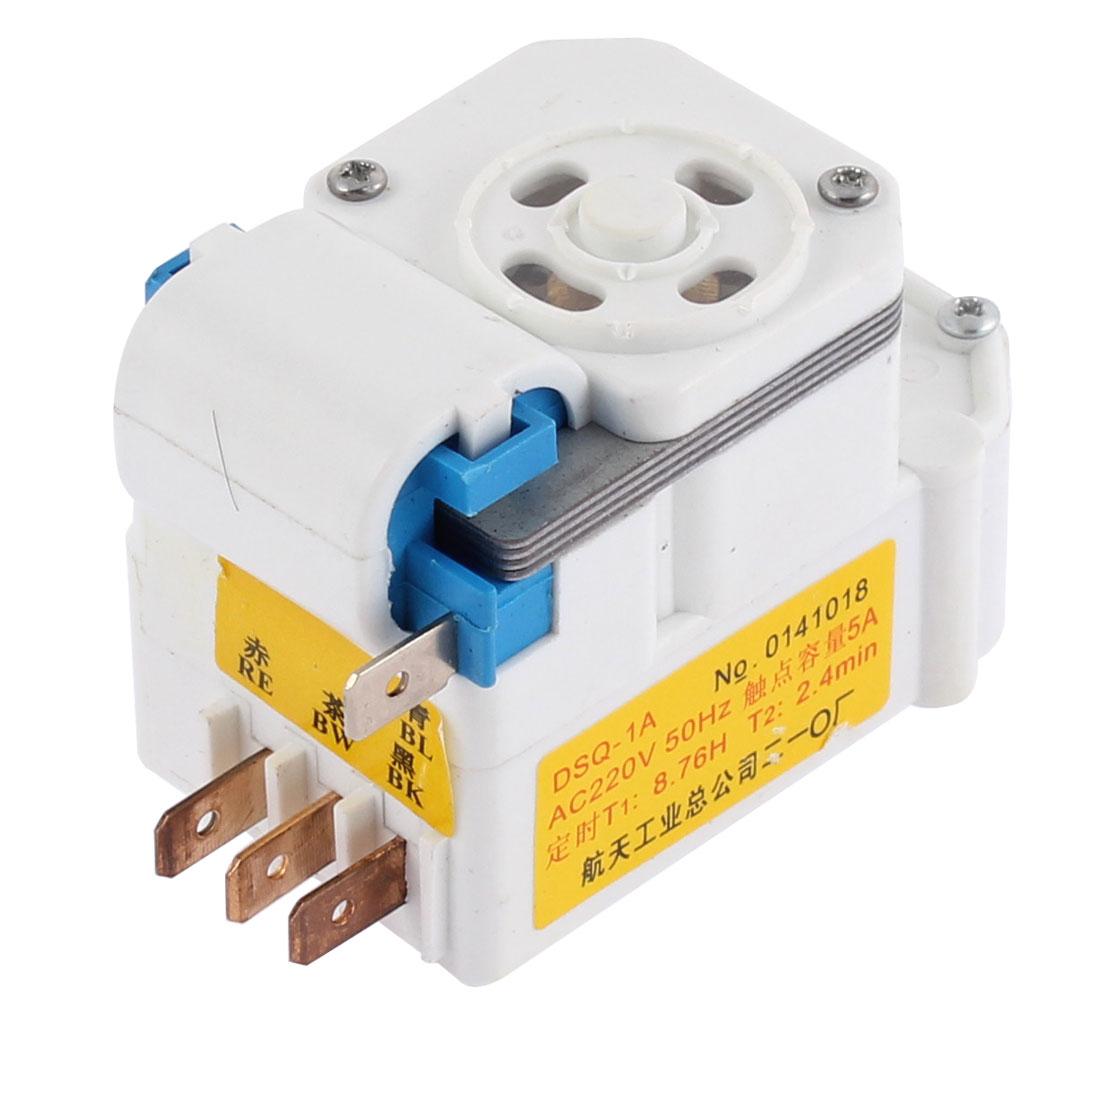 AC 220V 4 Terminals Plastic Case Refrigerator Fridge Defrost Timer White